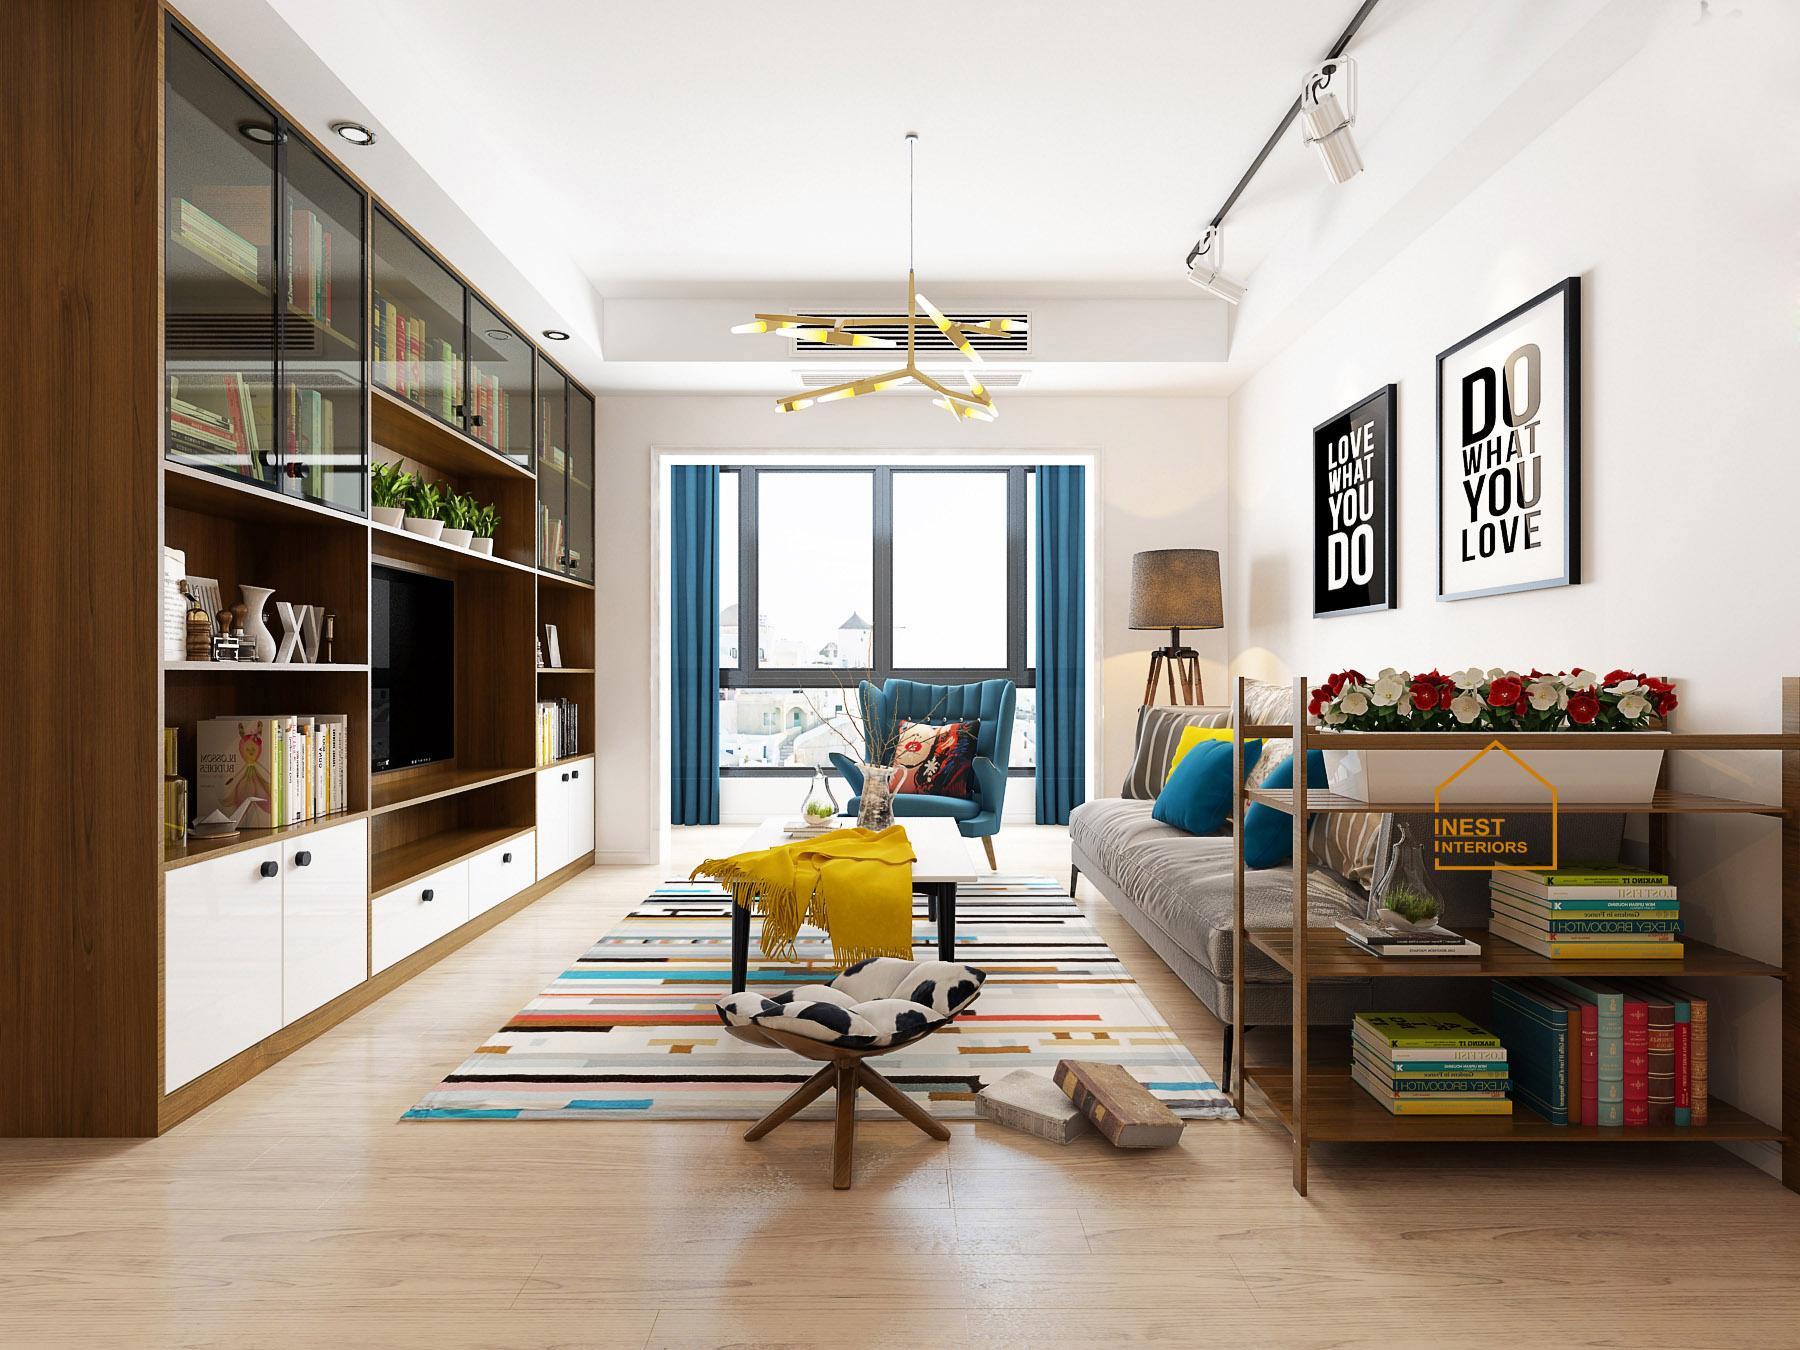 Thiết kế nội thất căn hộ vinhomes ocean park